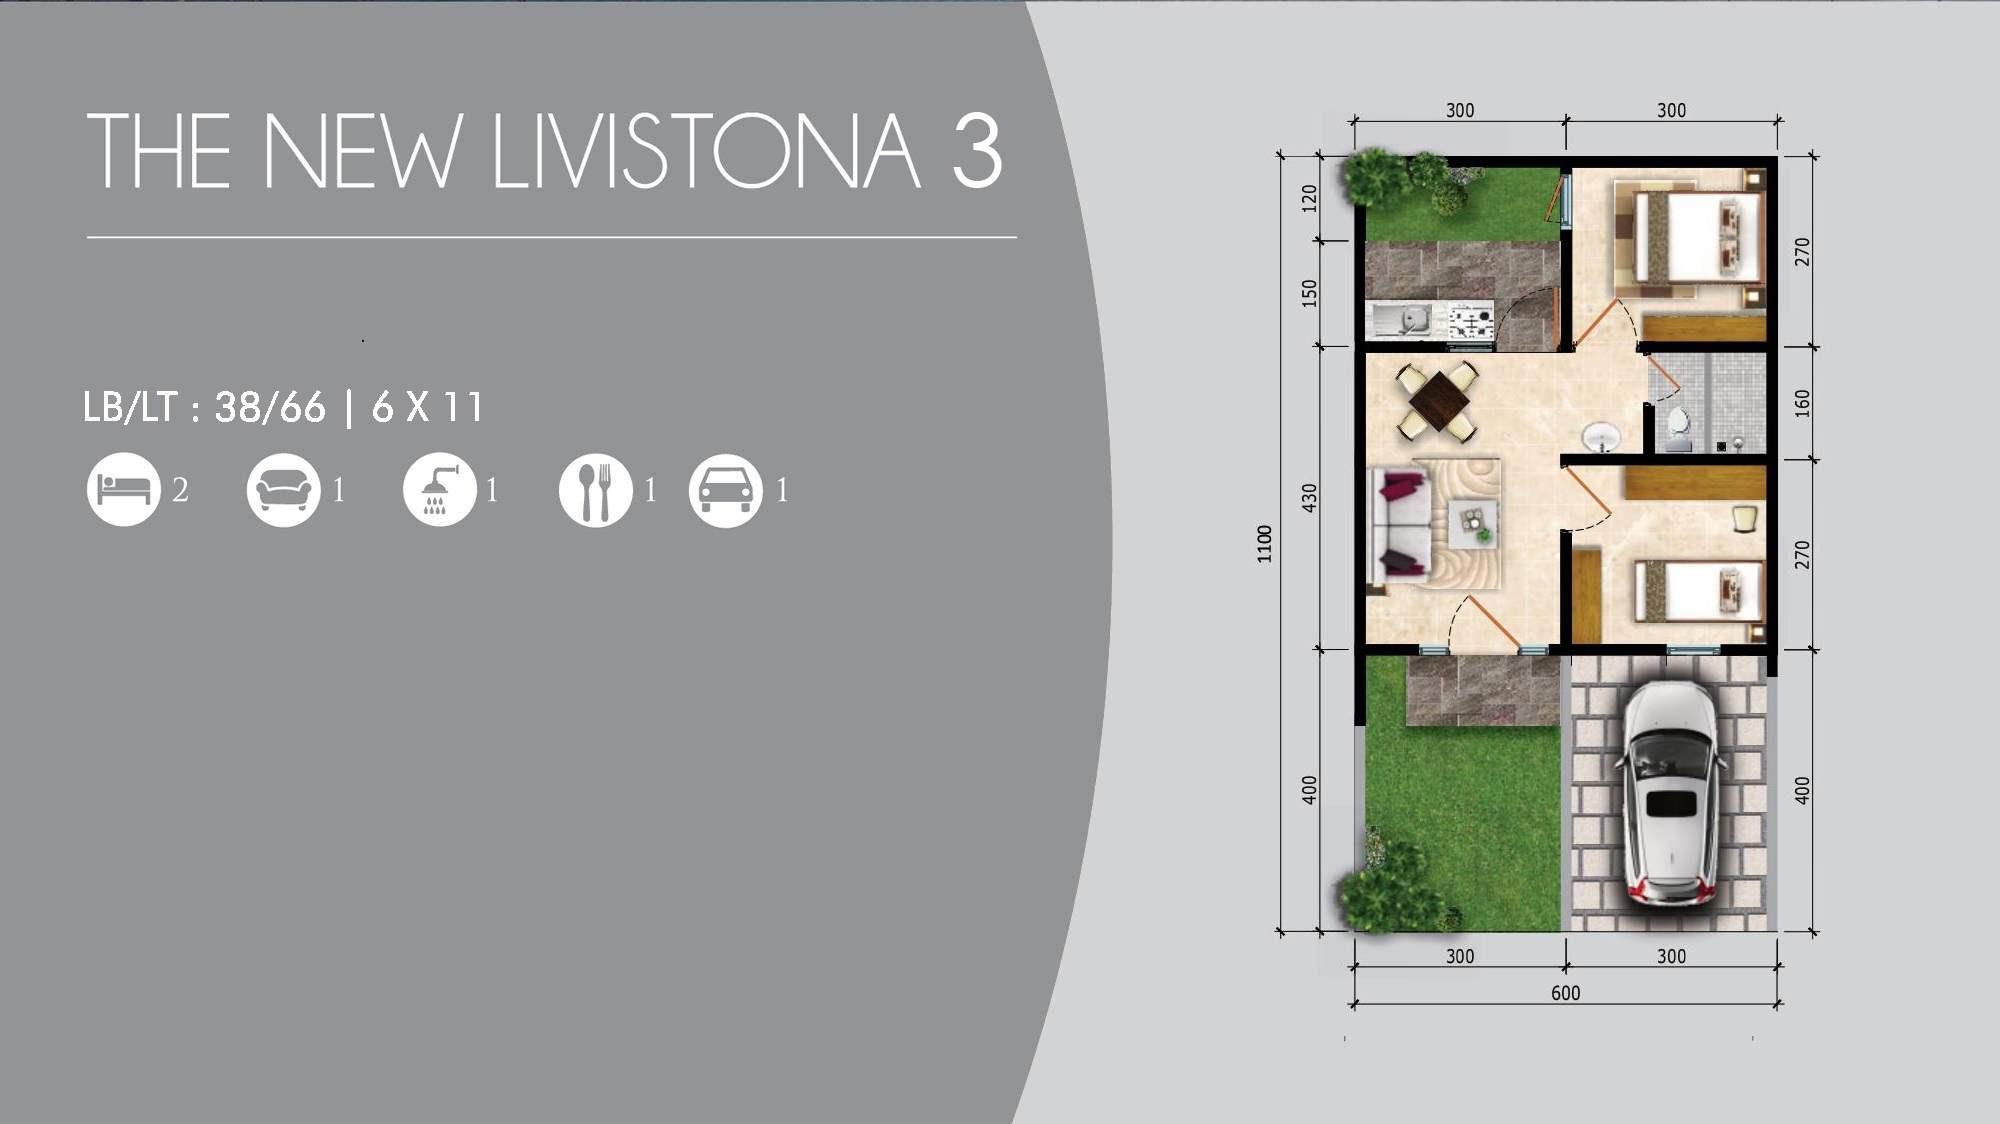 CitraLand Cibubur Cluster The New Livistona